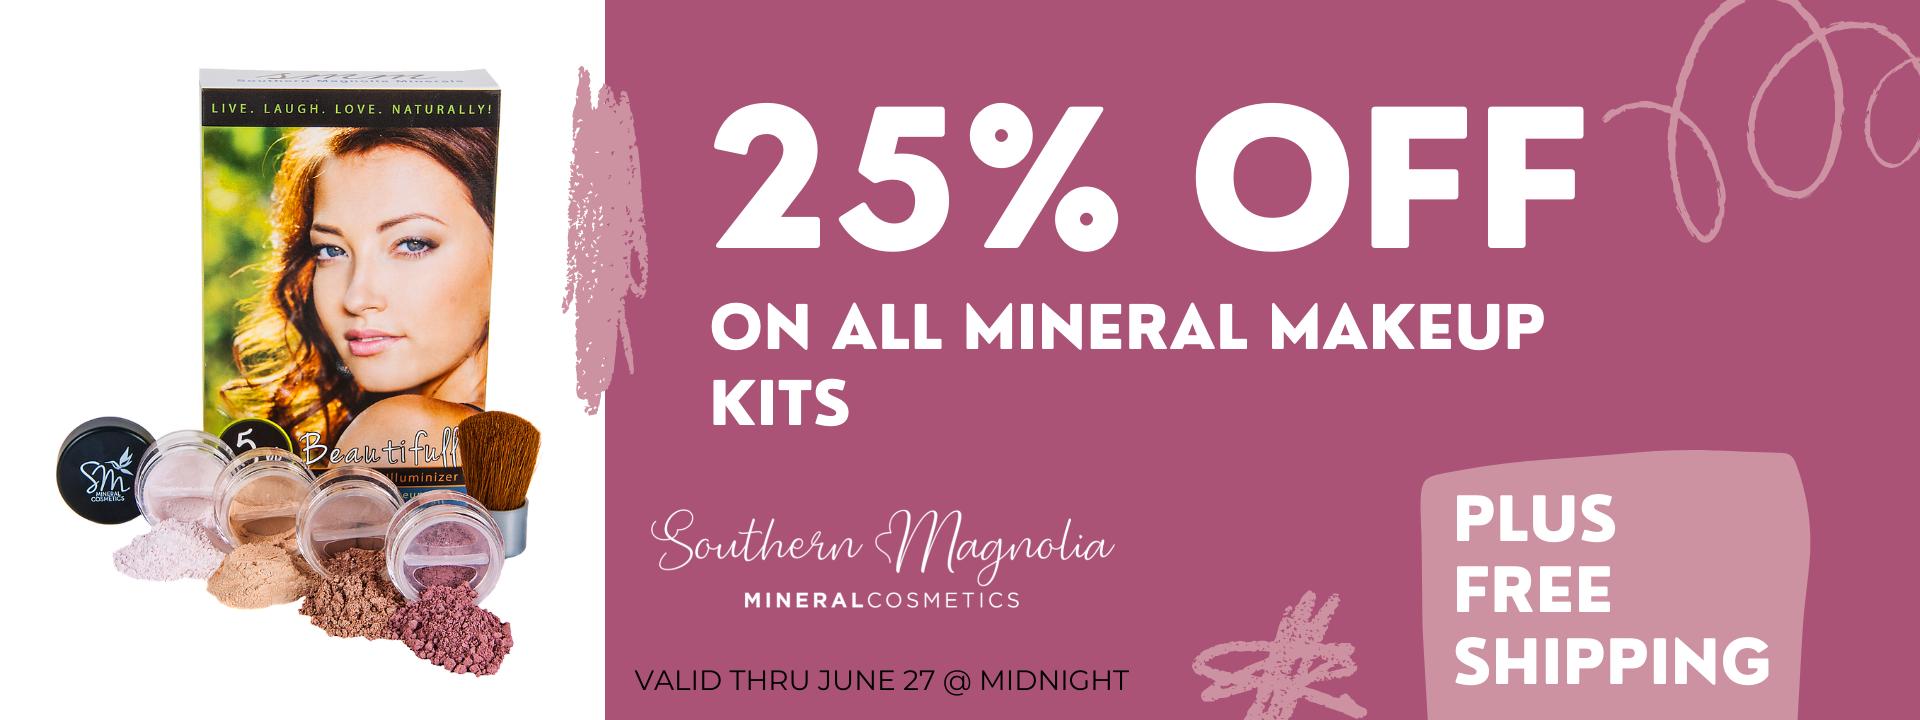 makeup-kit-sale-retail-banner-1920x720.png